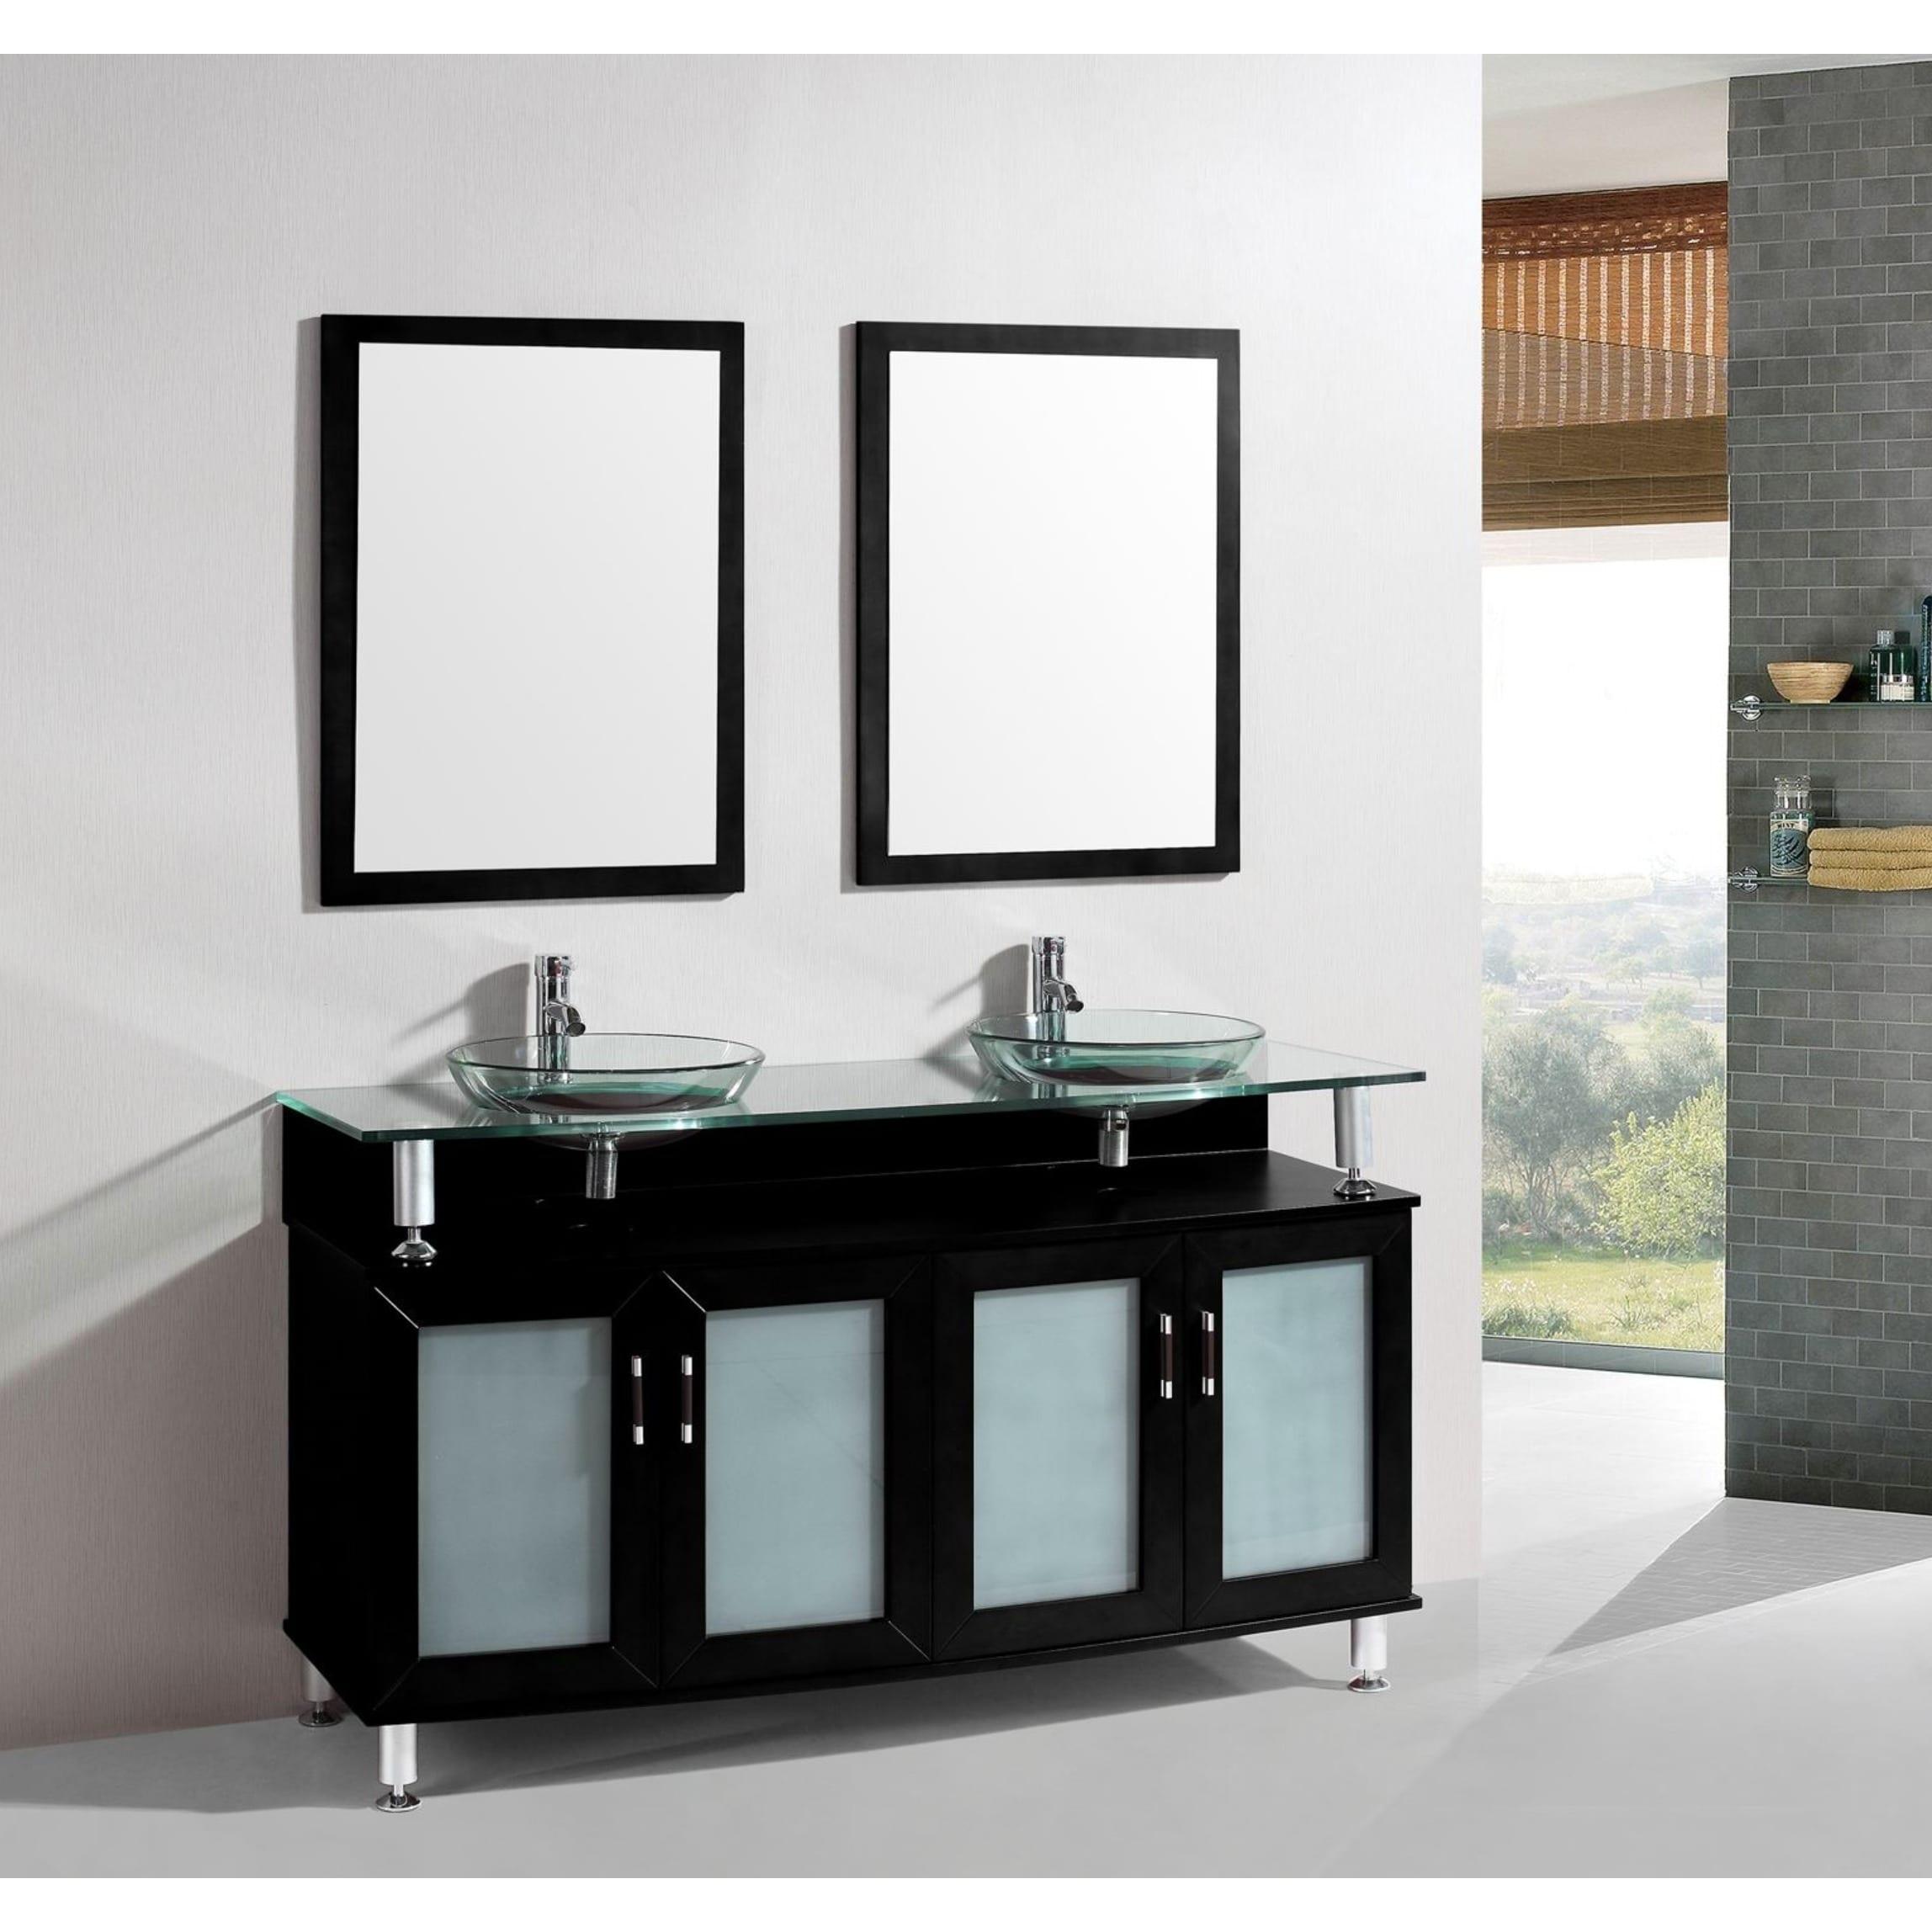 60 Inch Belvedere Modern Espresso Double Bathroom Vanity With Tempered Glass Sinks Overstock 14161694